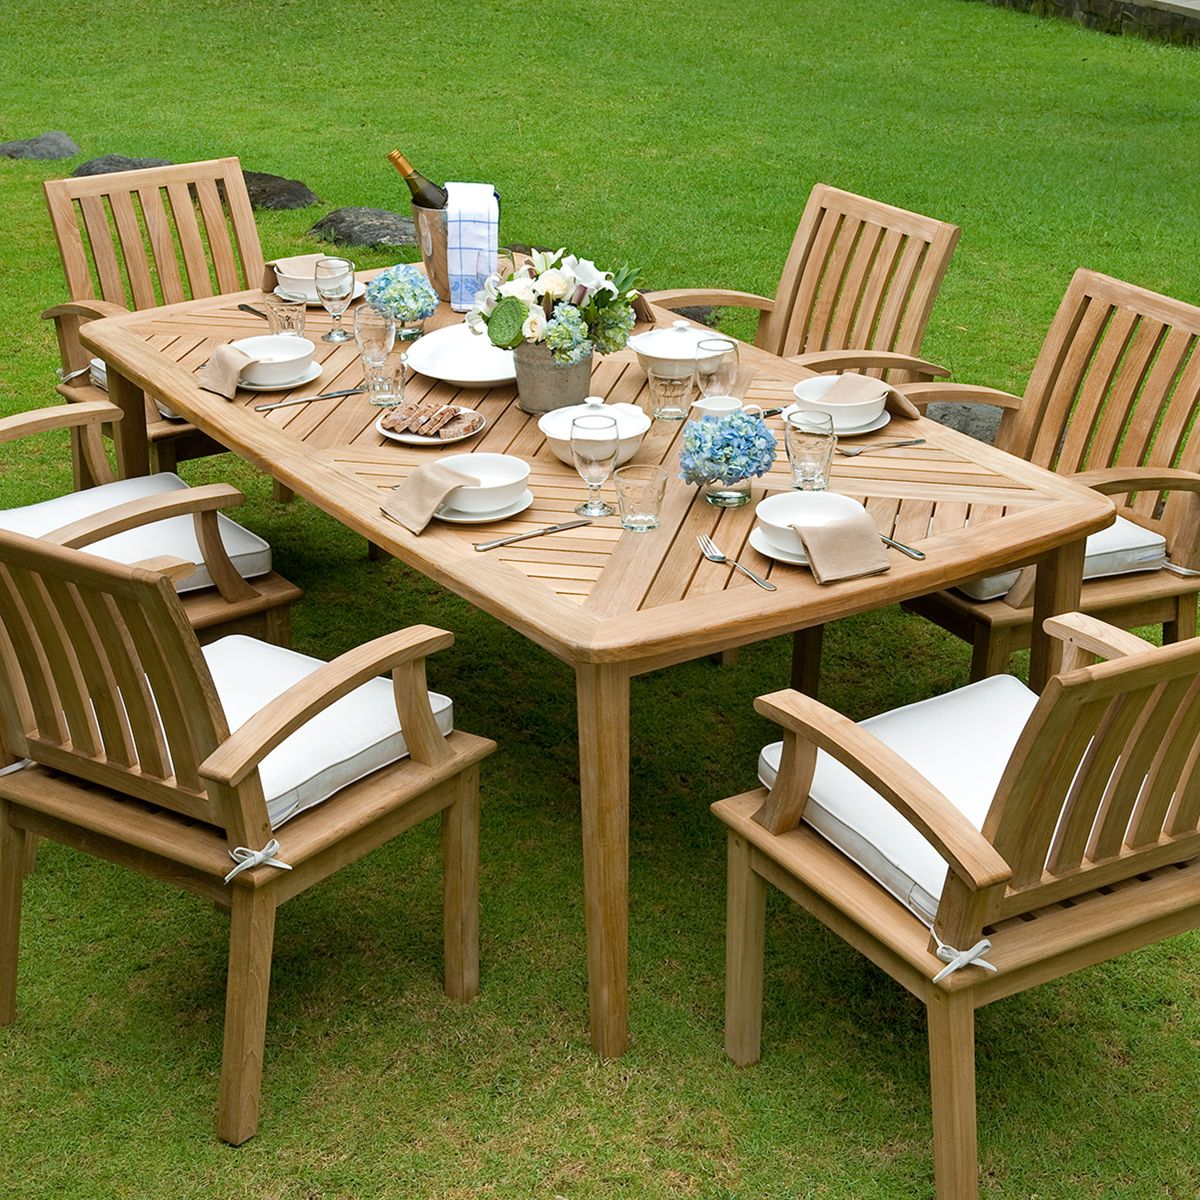 Table Veranda Fine Furniture Design Veranda Eclat Lamp Table End